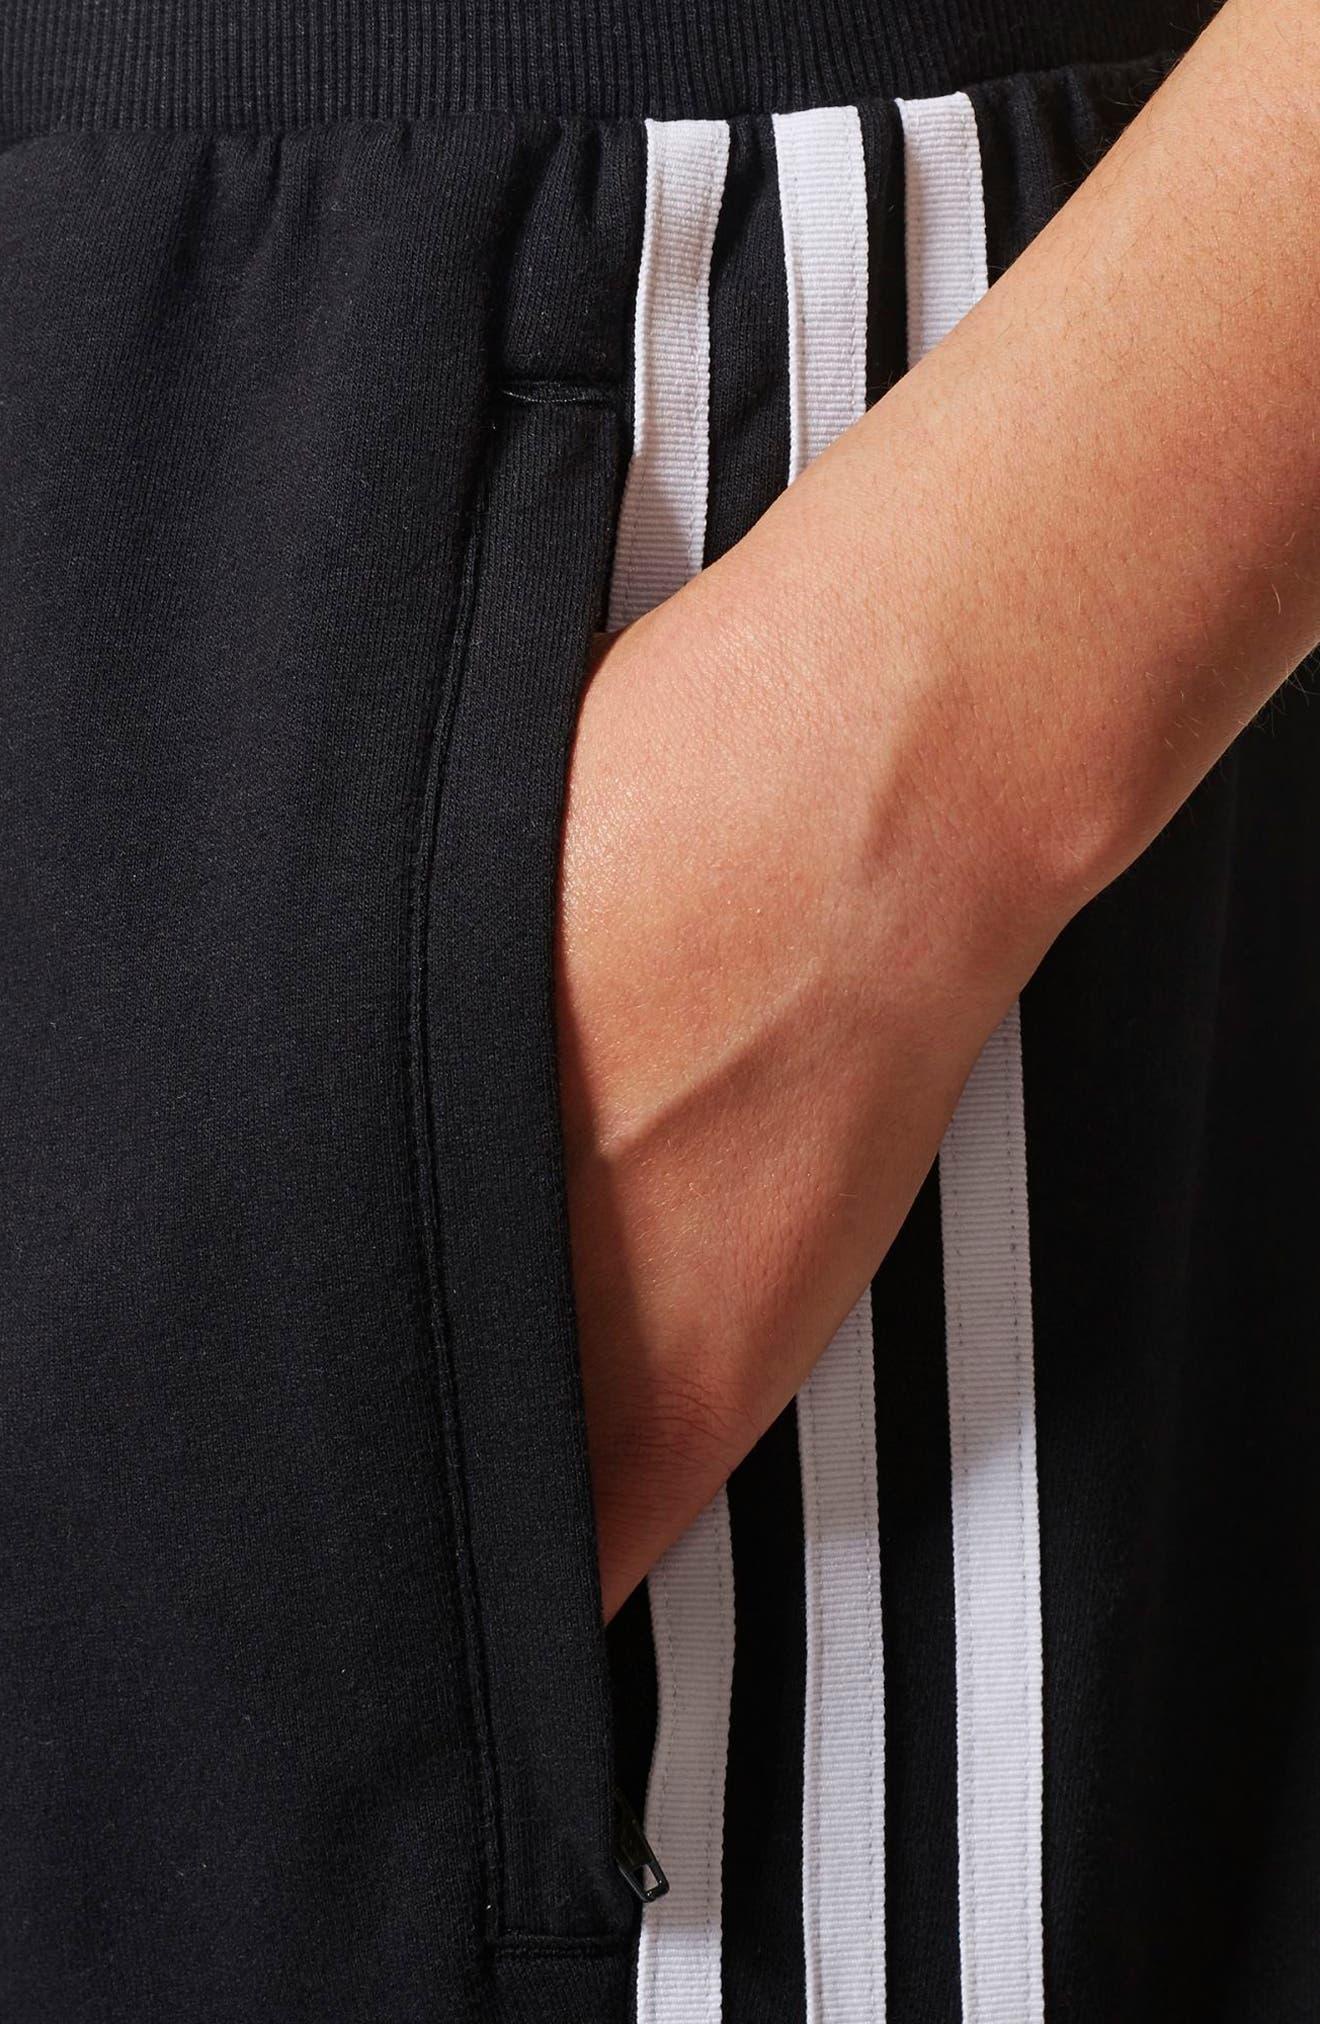 3-Stripes Tapered Pants,                             Alternate thumbnail 4, color,                             001